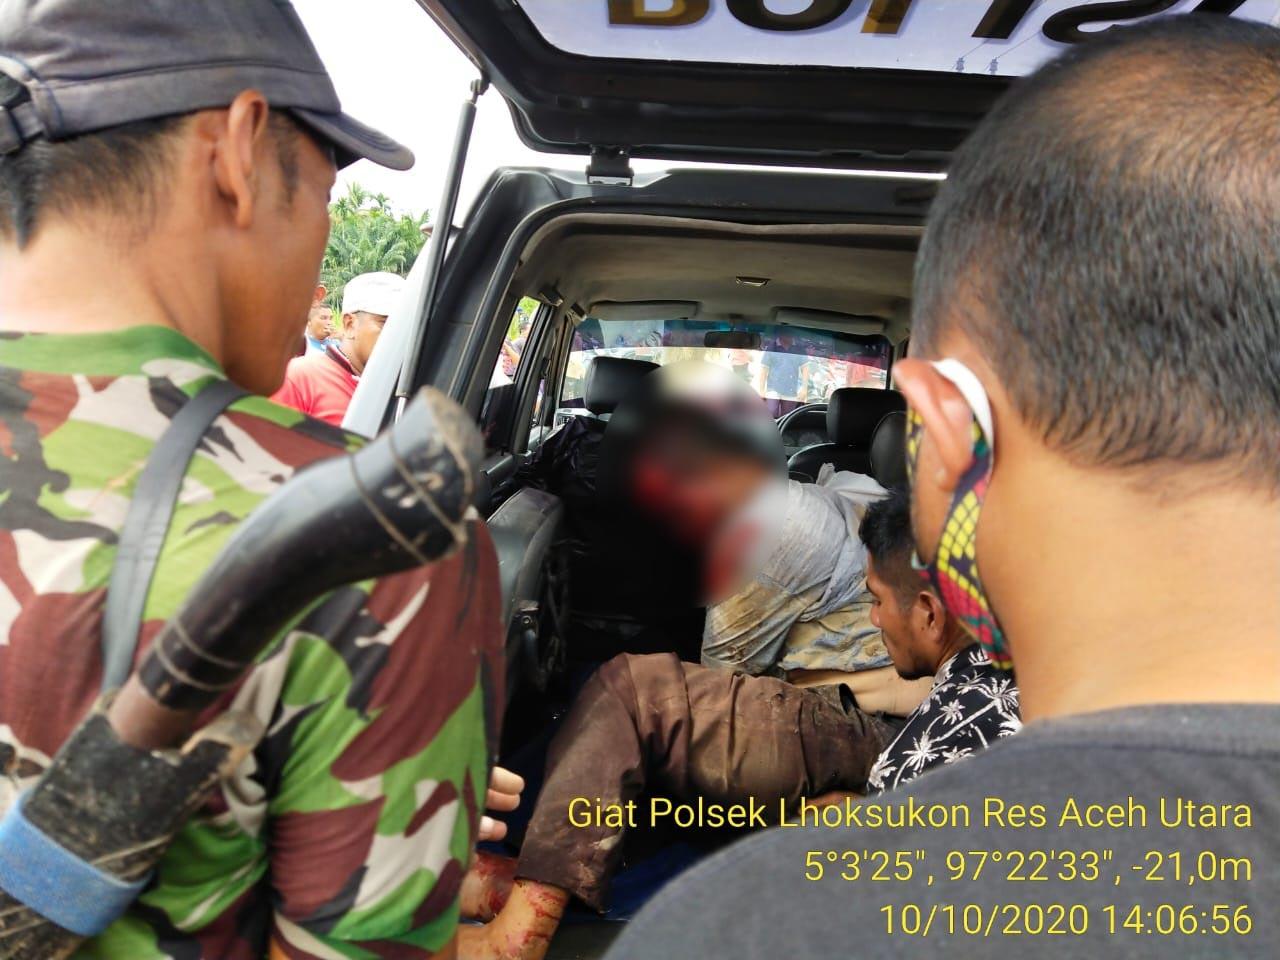 Kabur Diteriaki Maling, Pria Paruh Baya di Lhoksukon Kritis Karena Kecelakaan